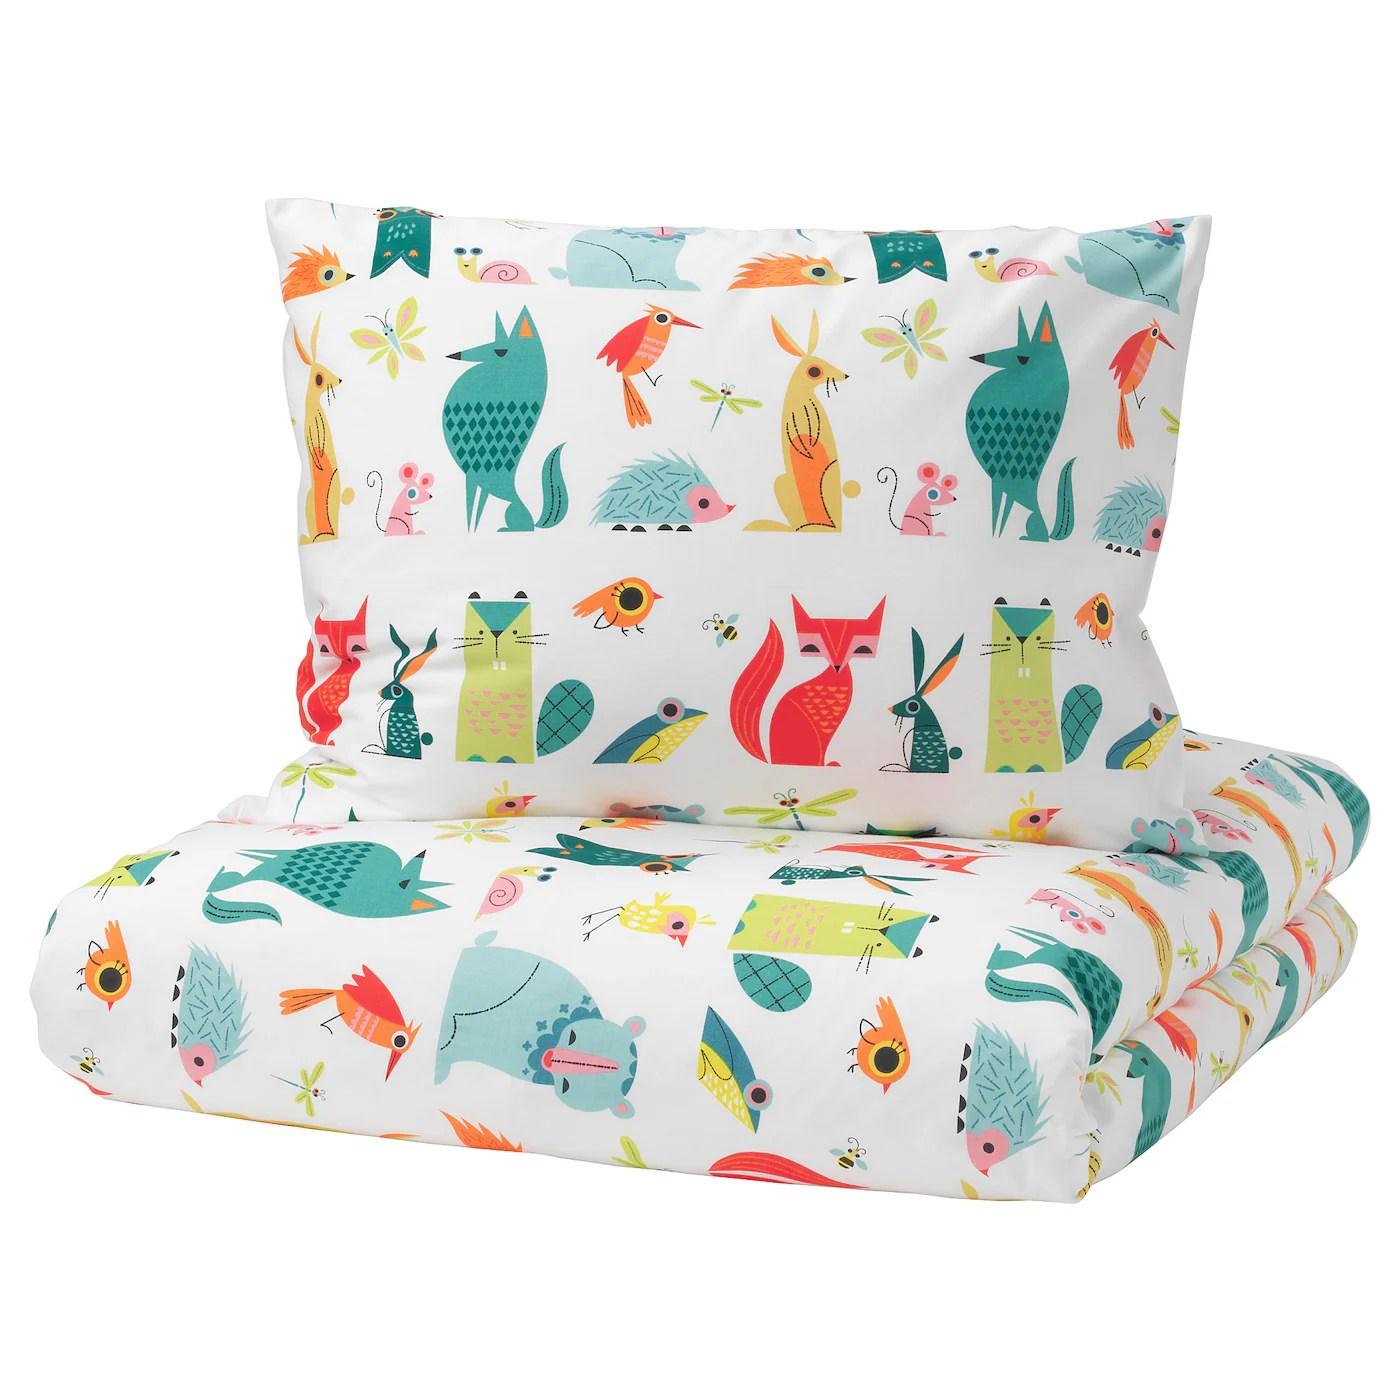 Lattjo Housse Couette Taie Animal Multicolore 150x200 65x65 Cm Ikea